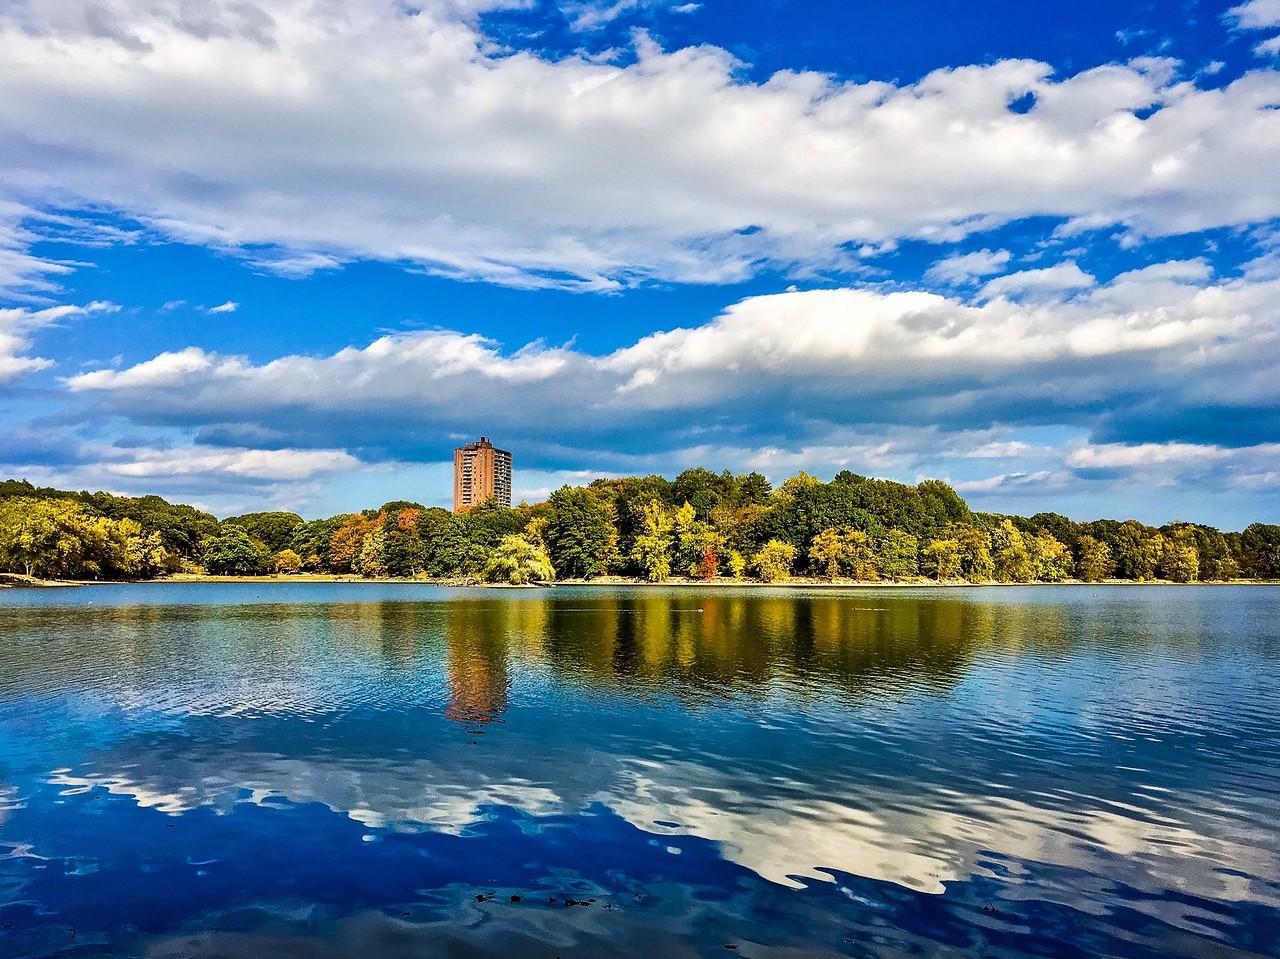 Jamaica Pond in the Jamaica Plain neighborhood of Boston, Massachusetts. Shot with iPhone 6s.